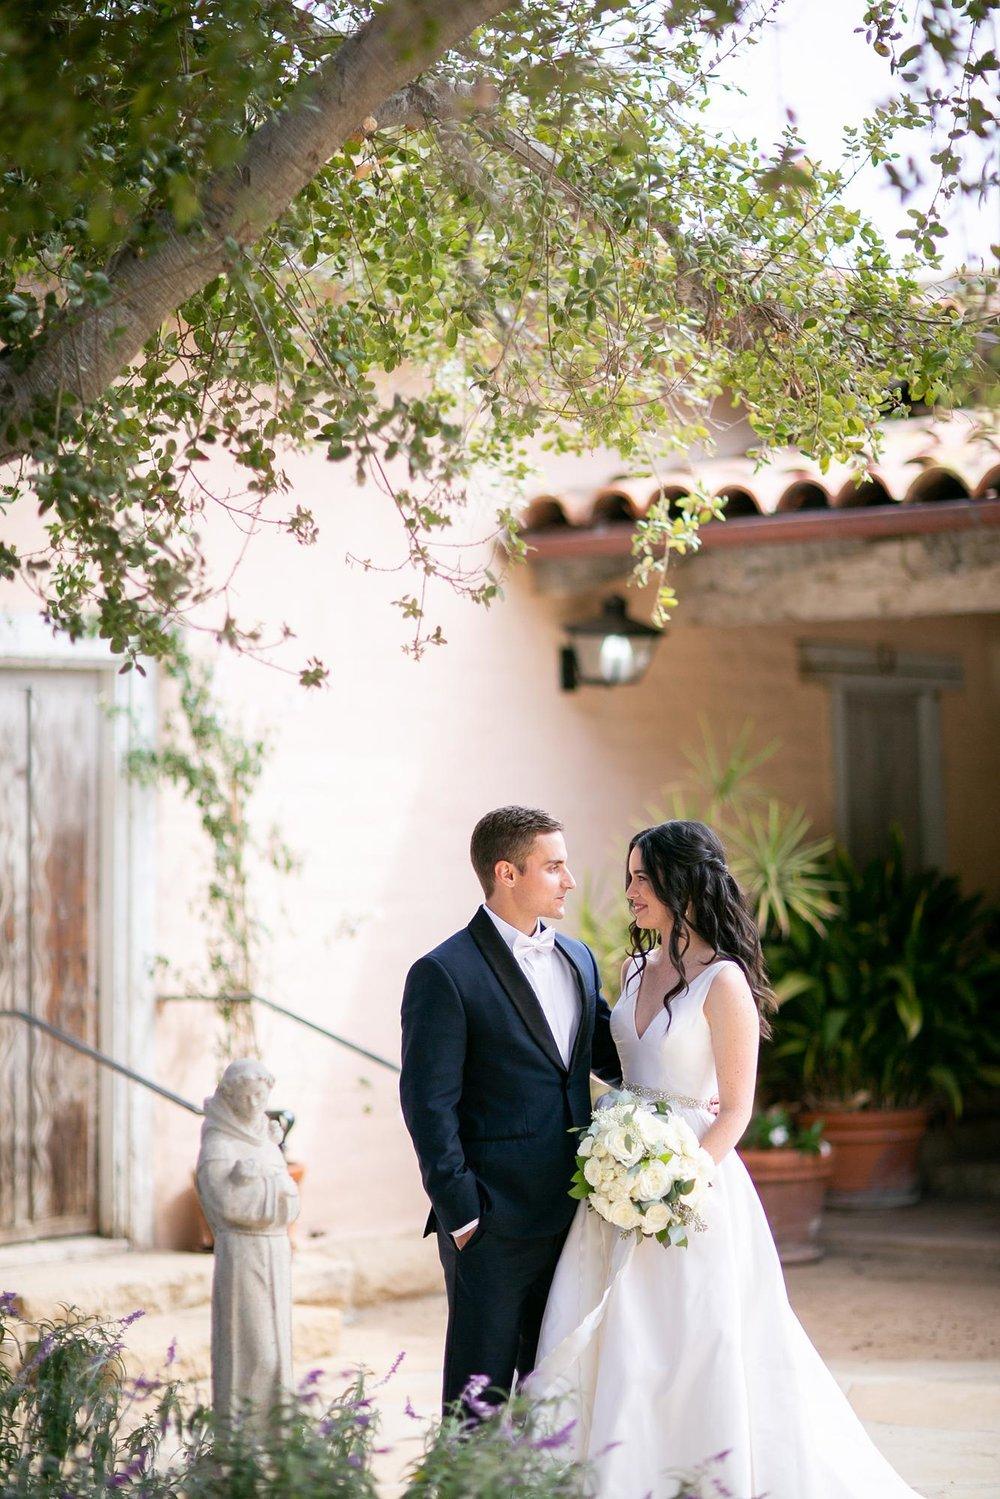 Santa Barbara Historical Museum Wedding | Miki & Sonja Photography | mikiandsonja.com